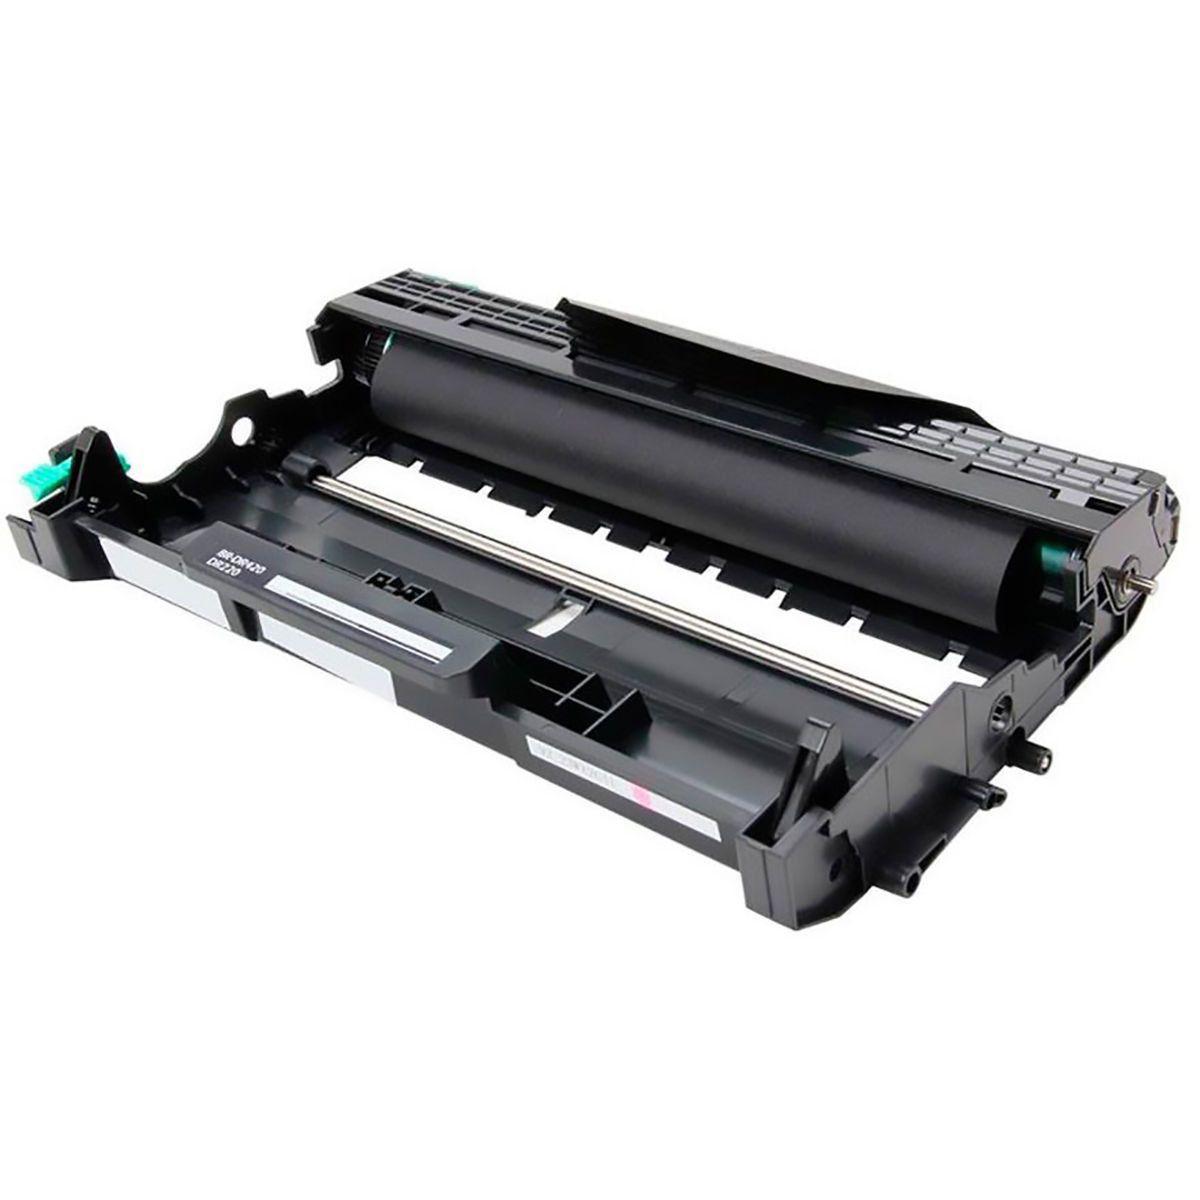 Compatível: Fotocondutor DR420 para Brother DCP-7065 7065dn 7055 MFC-7360 7360N 7860 7860dw HL-2270dw DCP7065 / 12.000